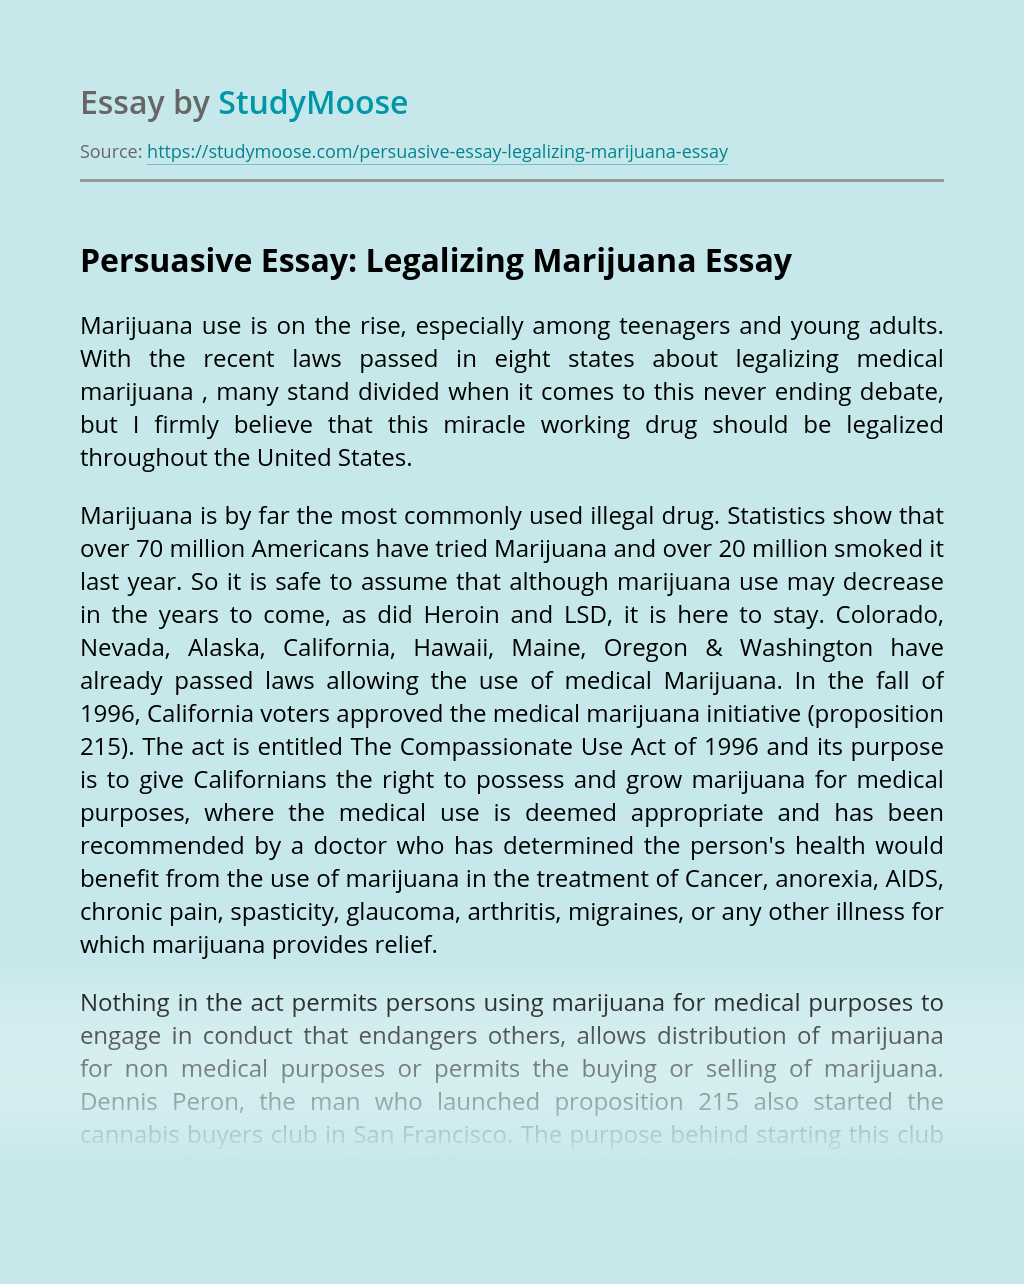 Legalization of marijuana argumentative essay a research paper outline